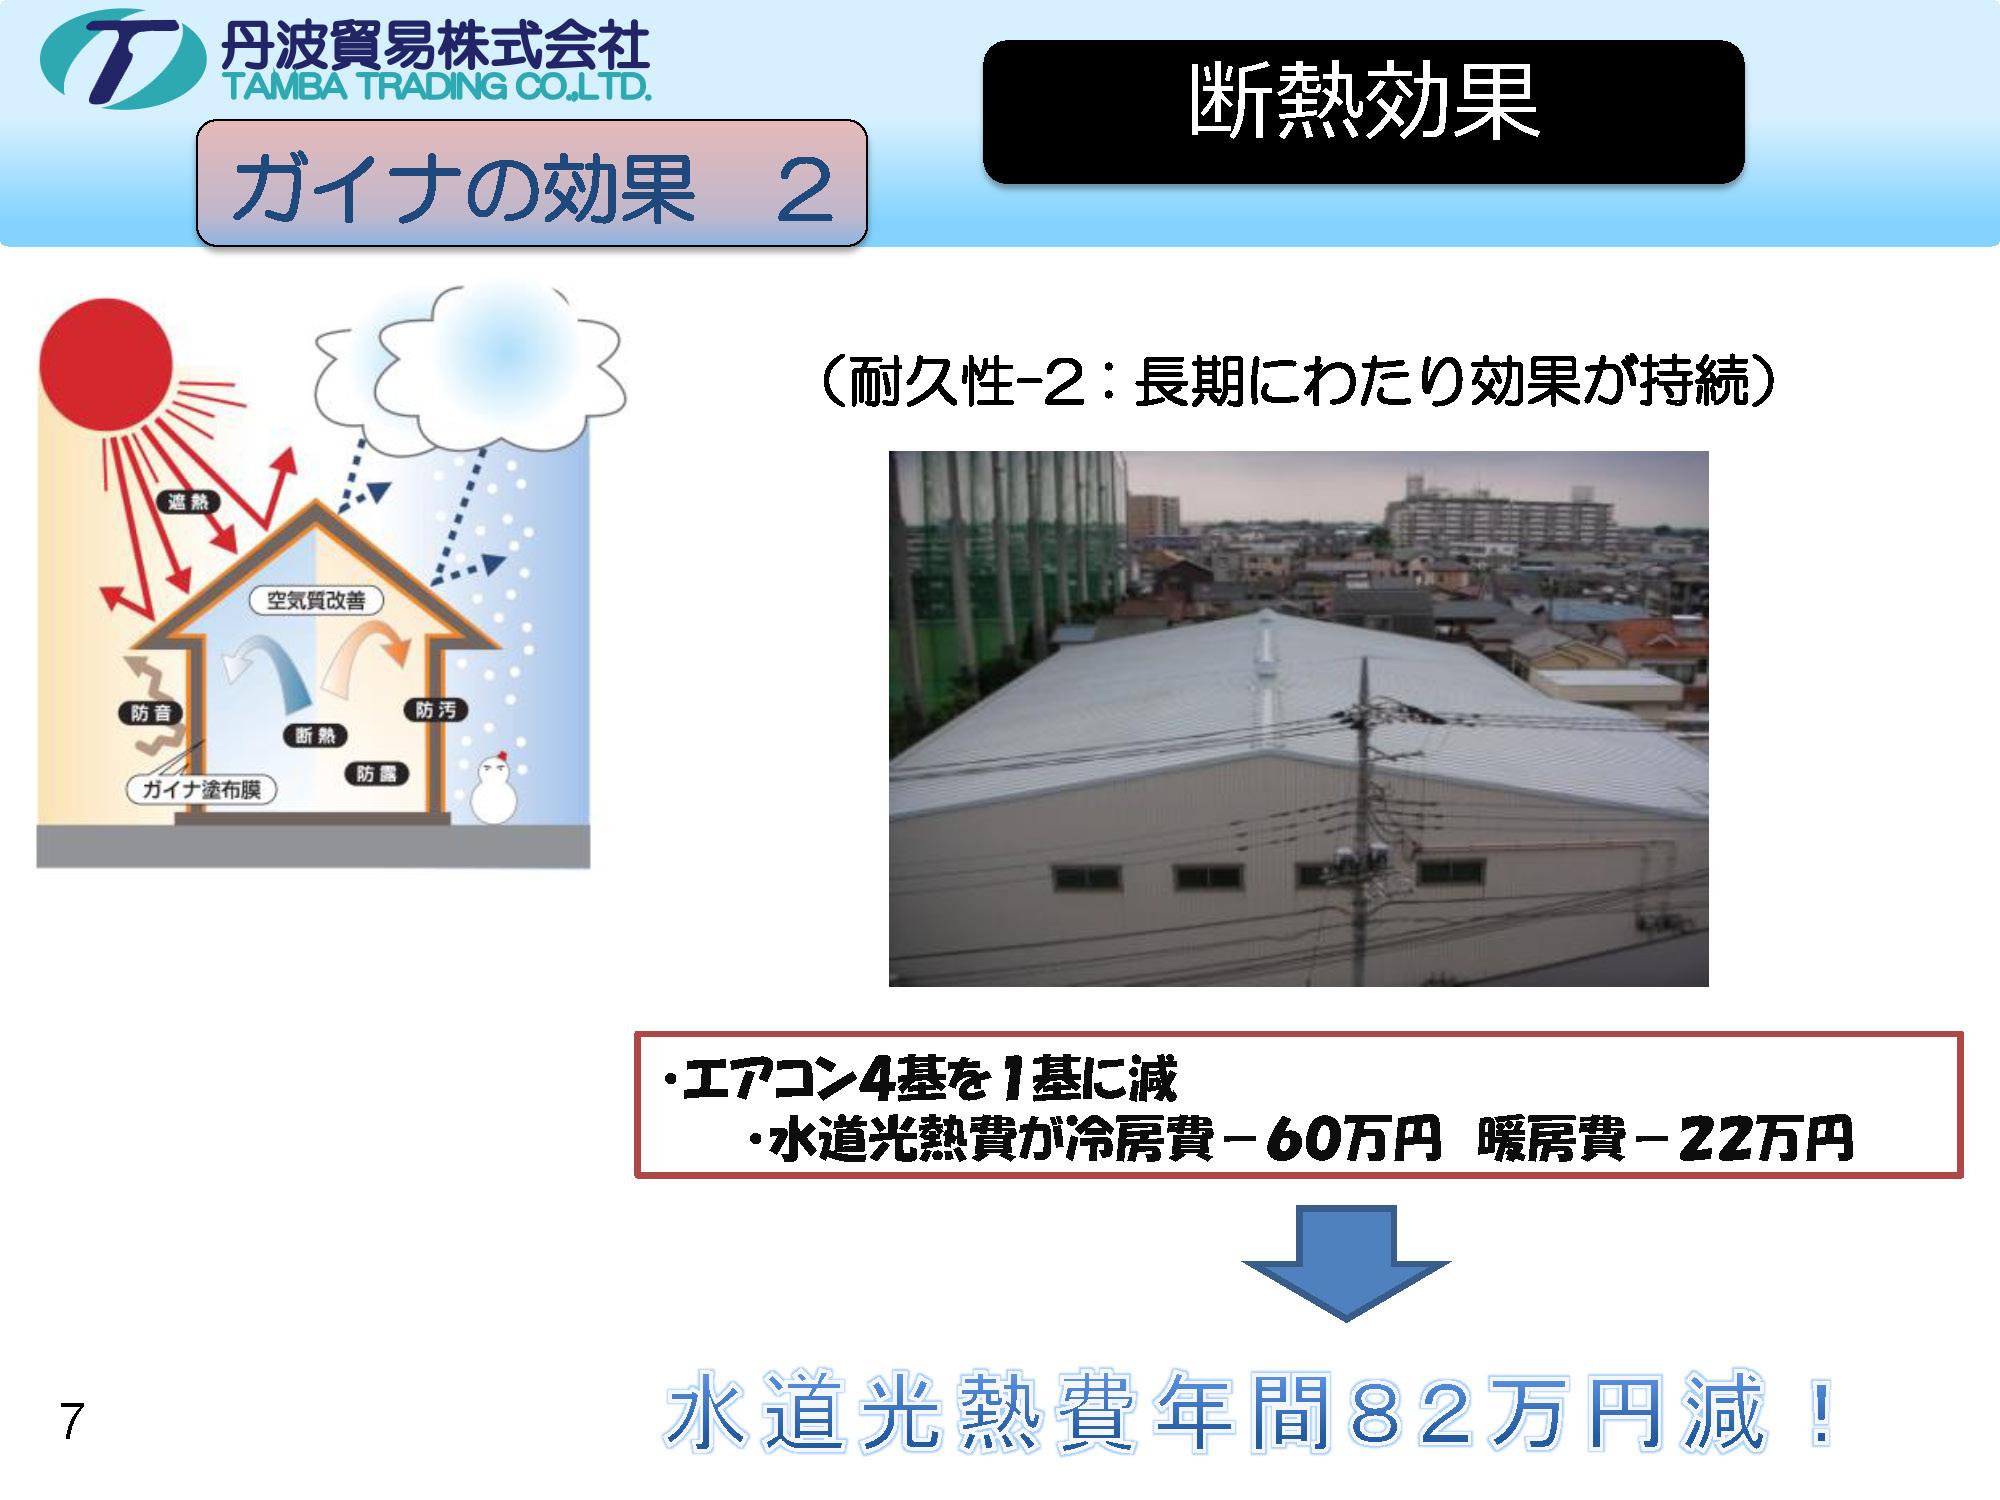 ガイナ紹介_丹波貿易_頁面_07